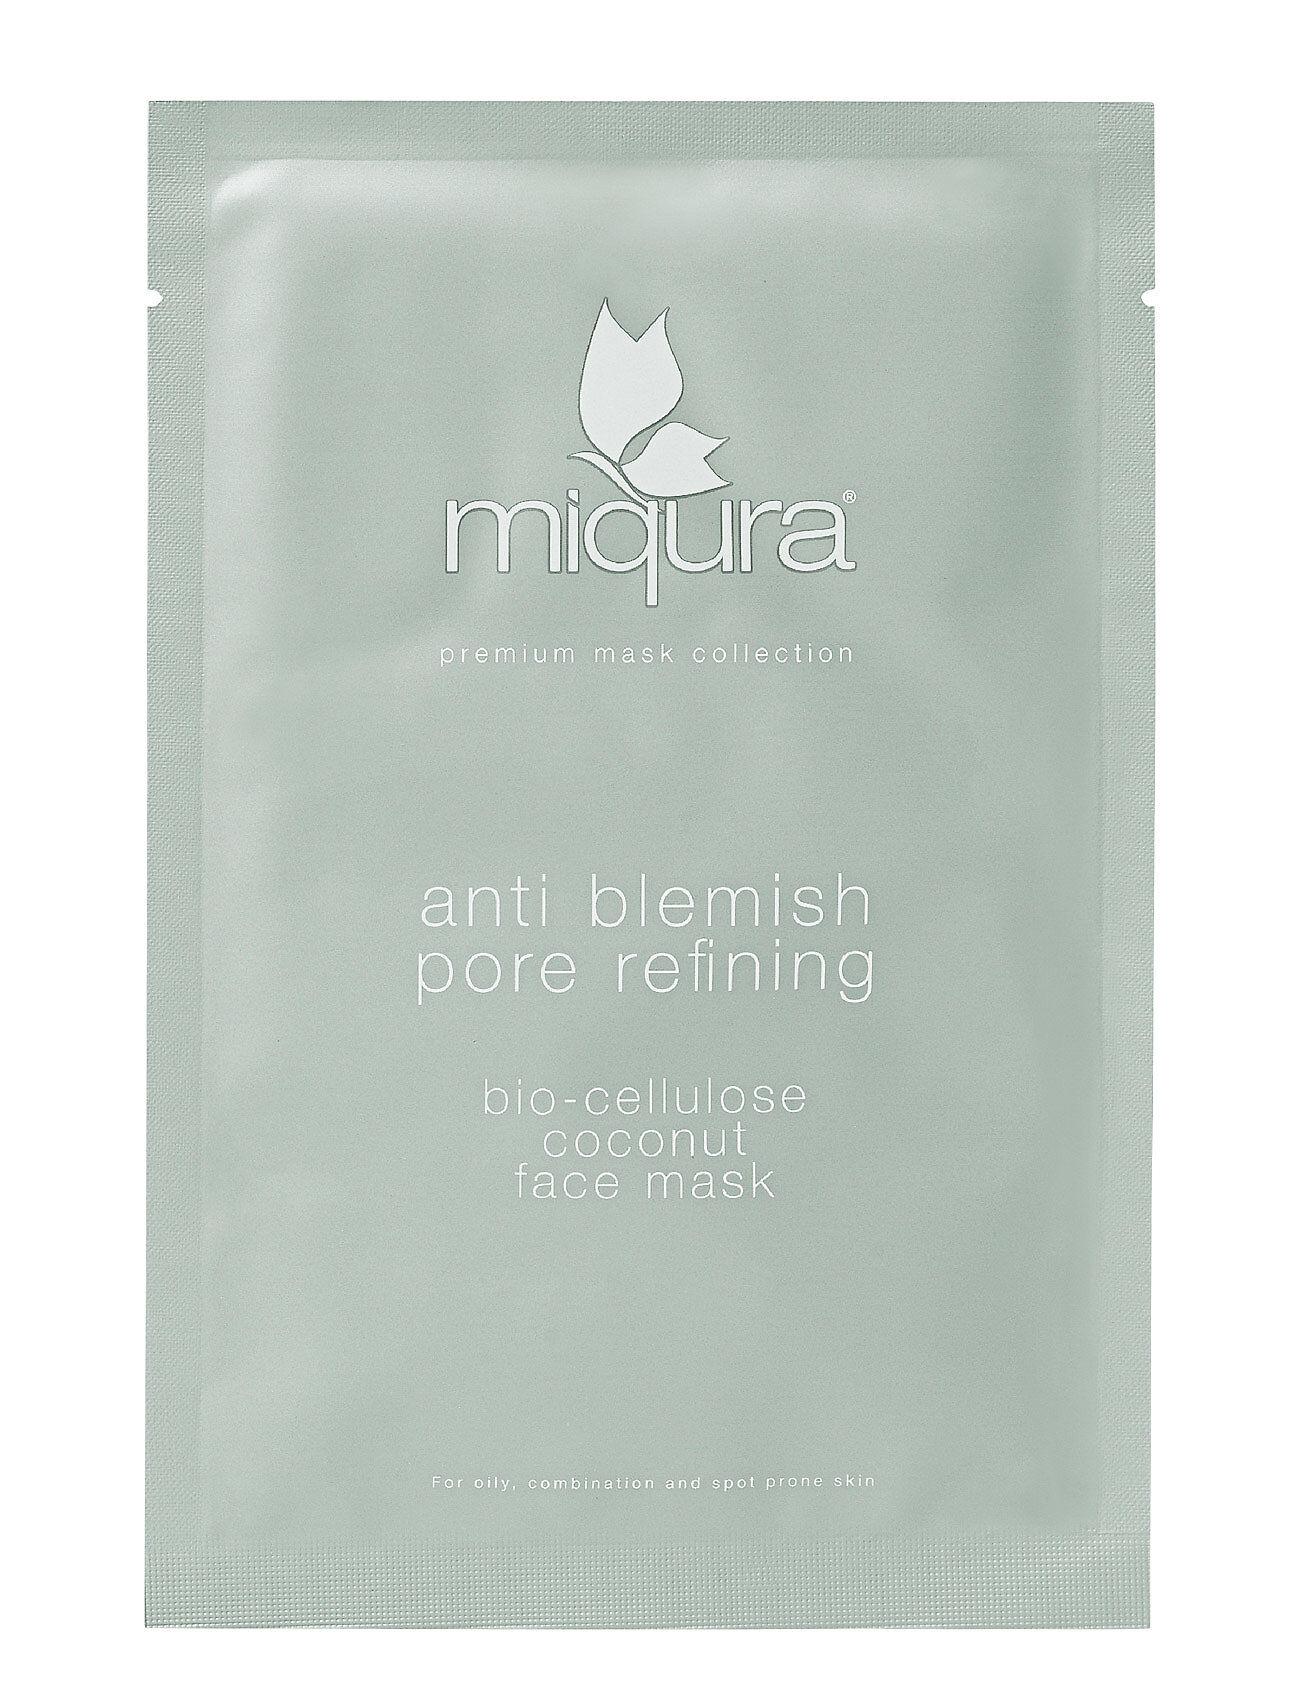 Miqura Anti Blemish Pore Refining Bio Cellulose Sheet Mask Beauty WOMEN Skin Care Face Sheet Mask Nude Miqura